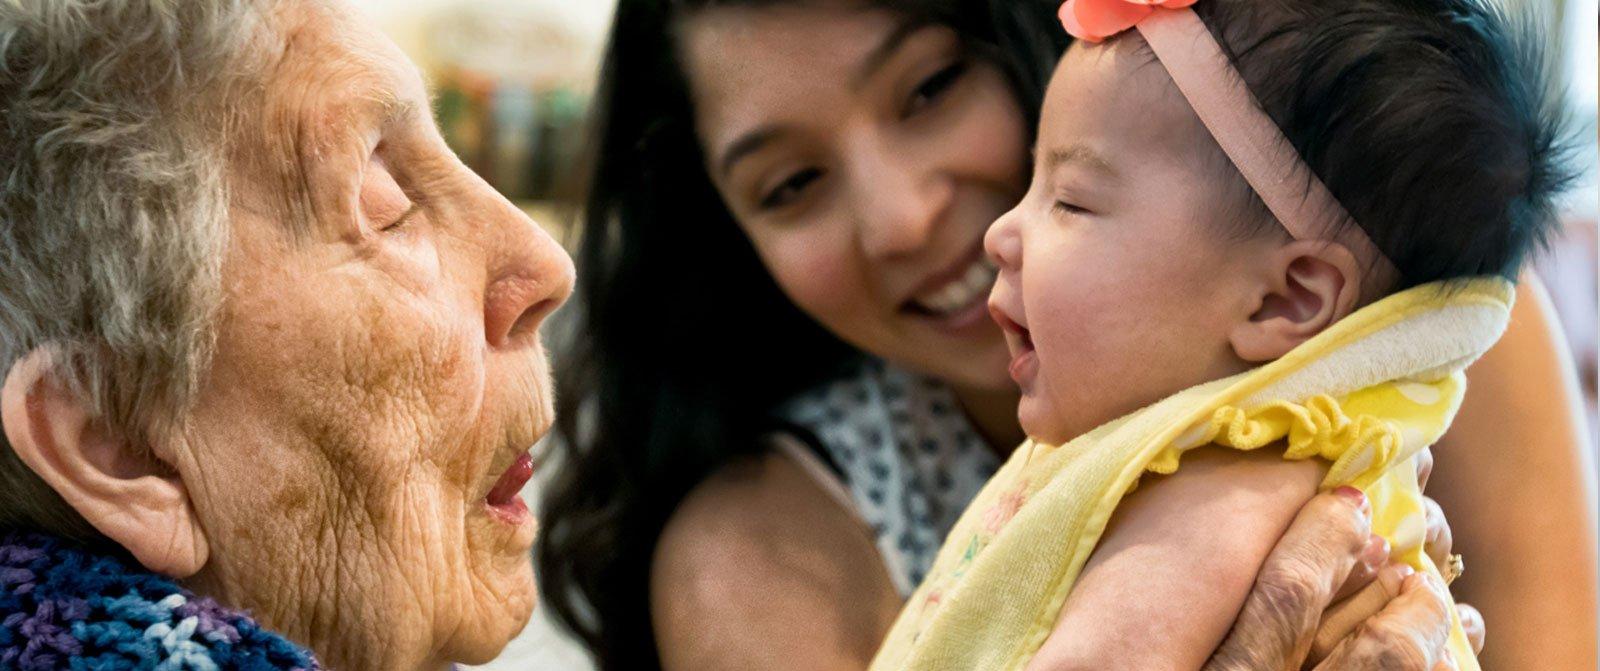 aburla-nina-madre-sonrisa-humana-medicina-prepagada